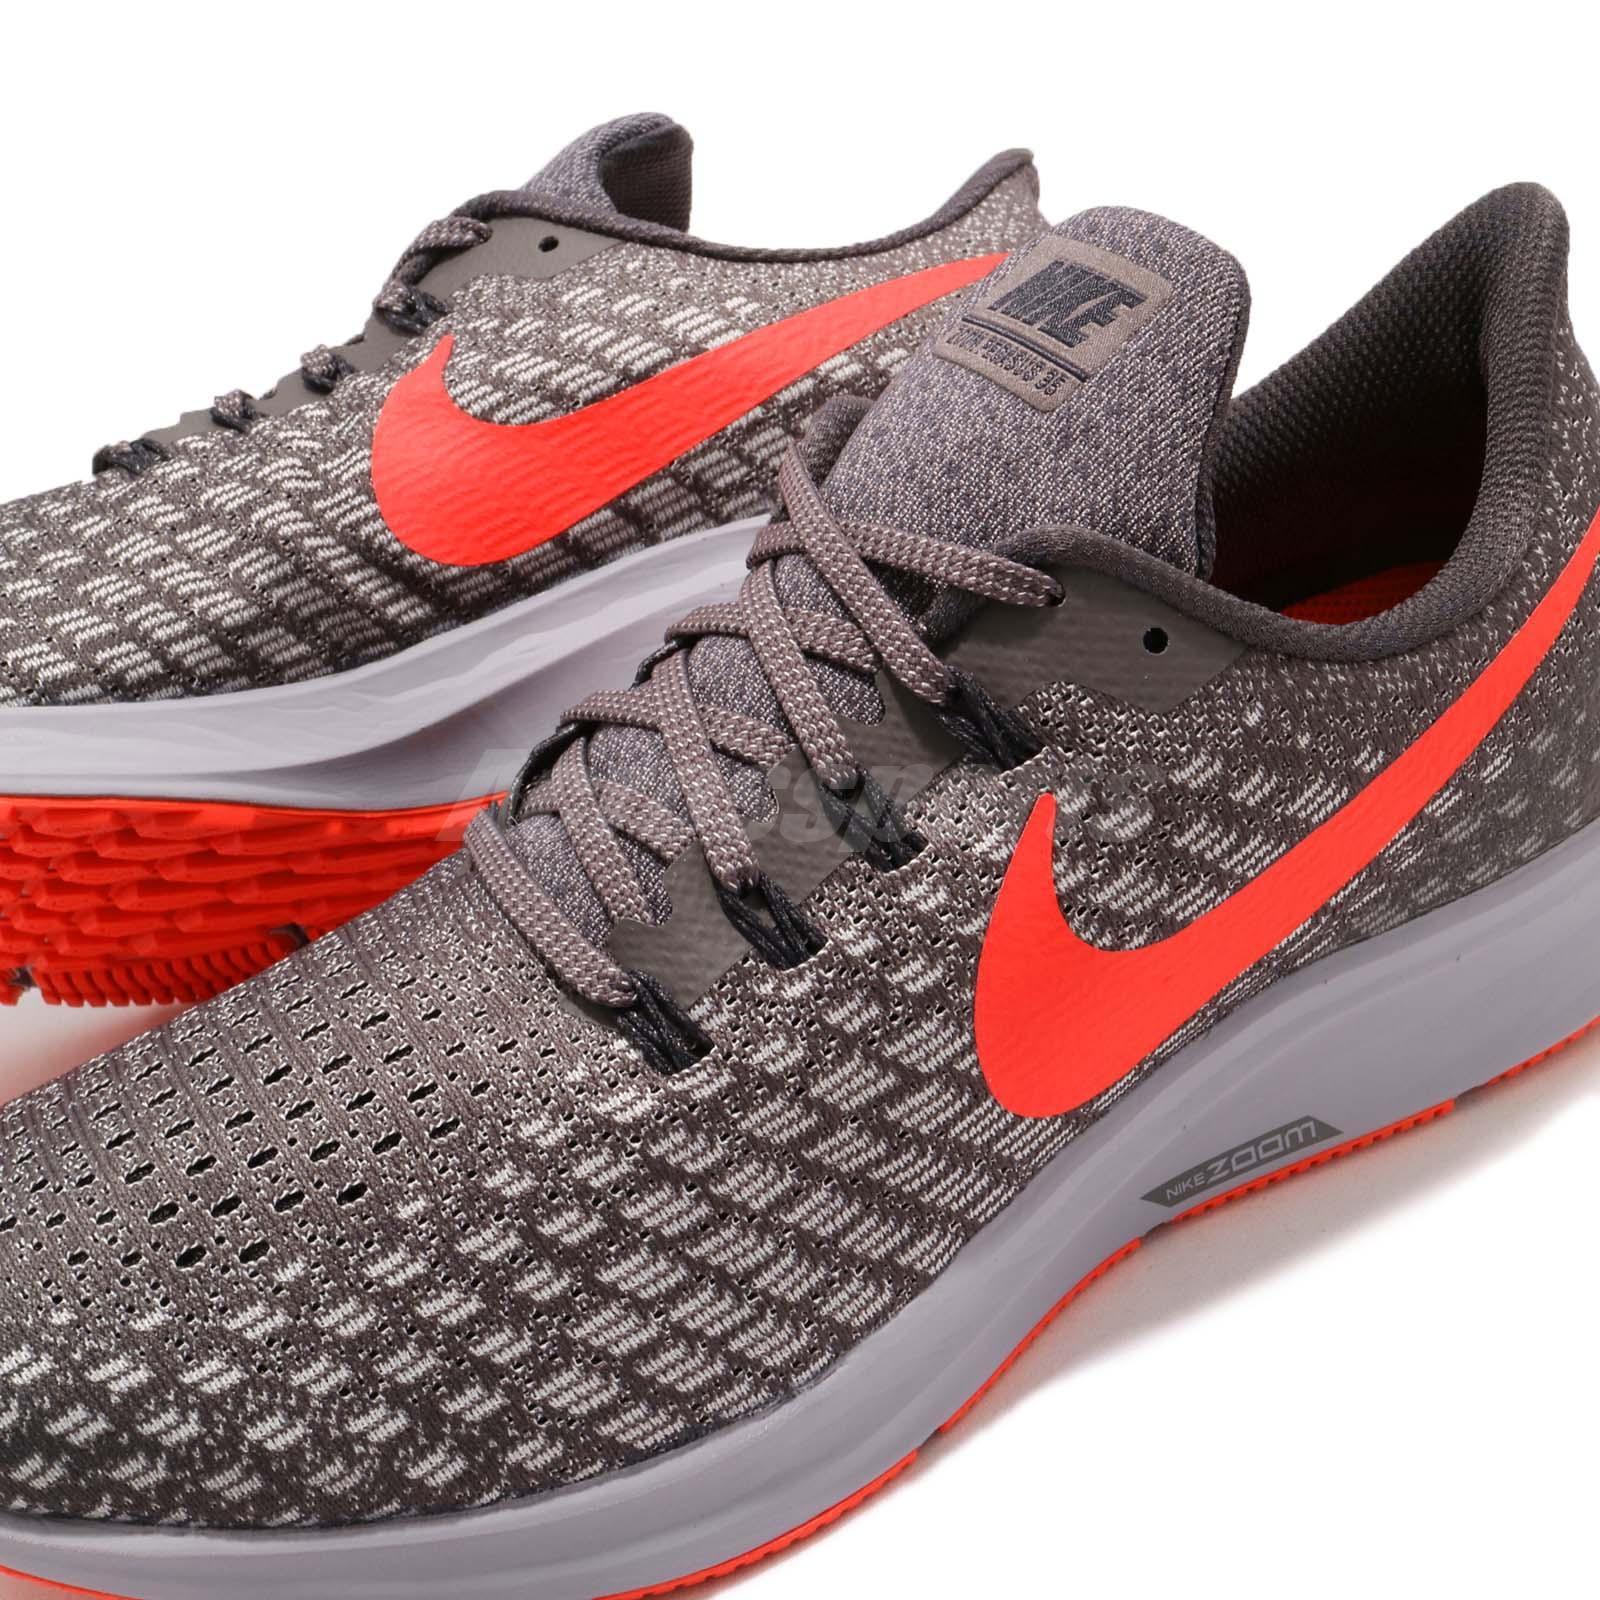 official photos 66eba ae46f Details about Nike Air Zoom Pegasus 35 Thunder Grey Bright Crimson Men  Running Shoe 942851-006